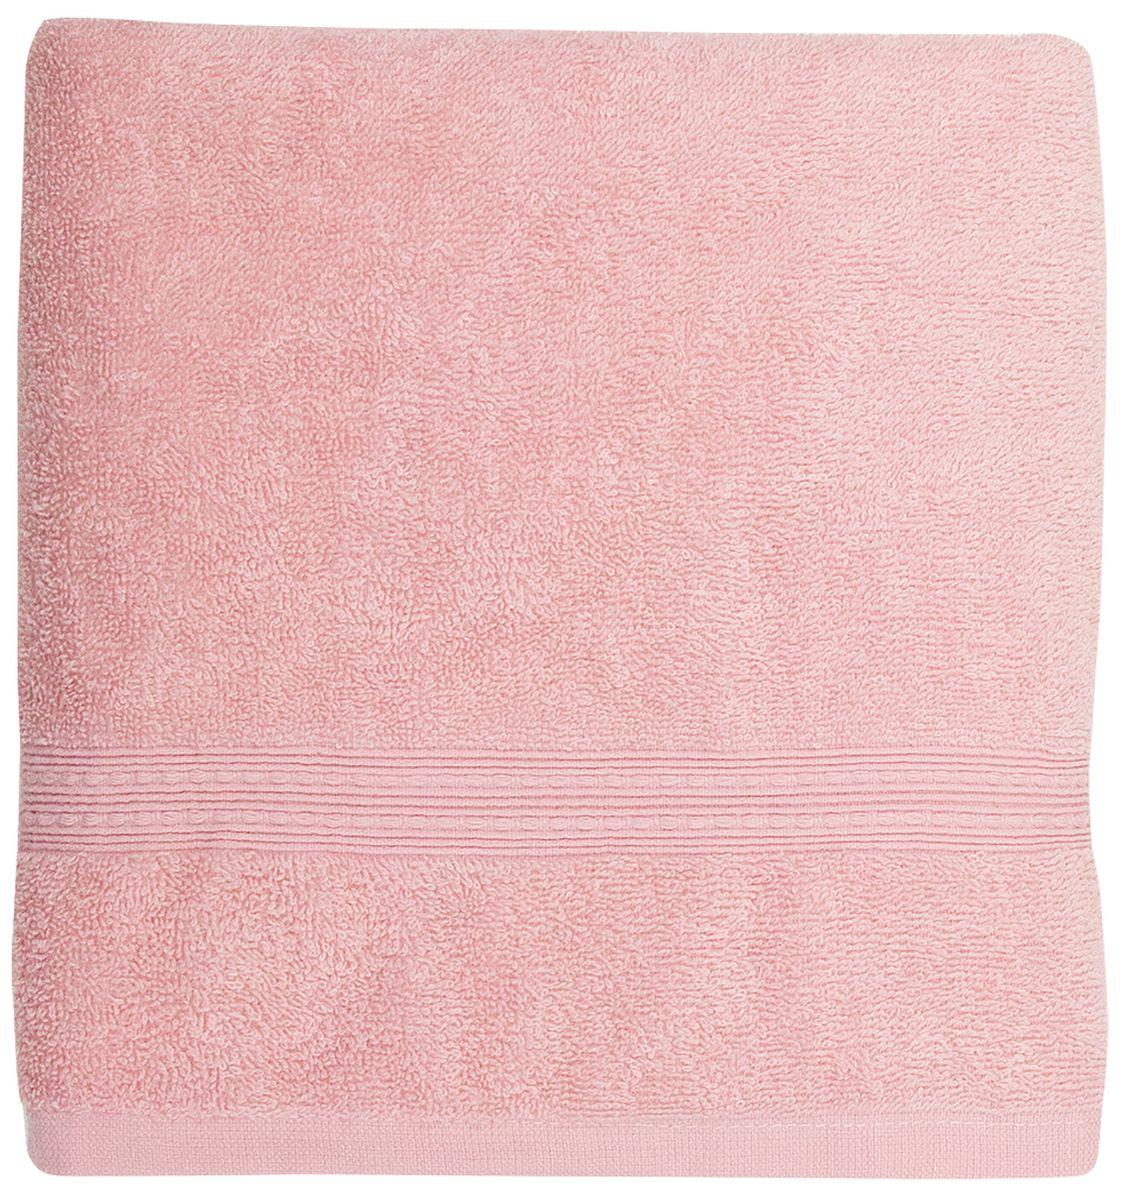 Полотенце банное Bonita Classic, махровое, цвет: роза, 70 х 140 см1011217225Полотенце банное 70*140 Bonita Classic, махровое